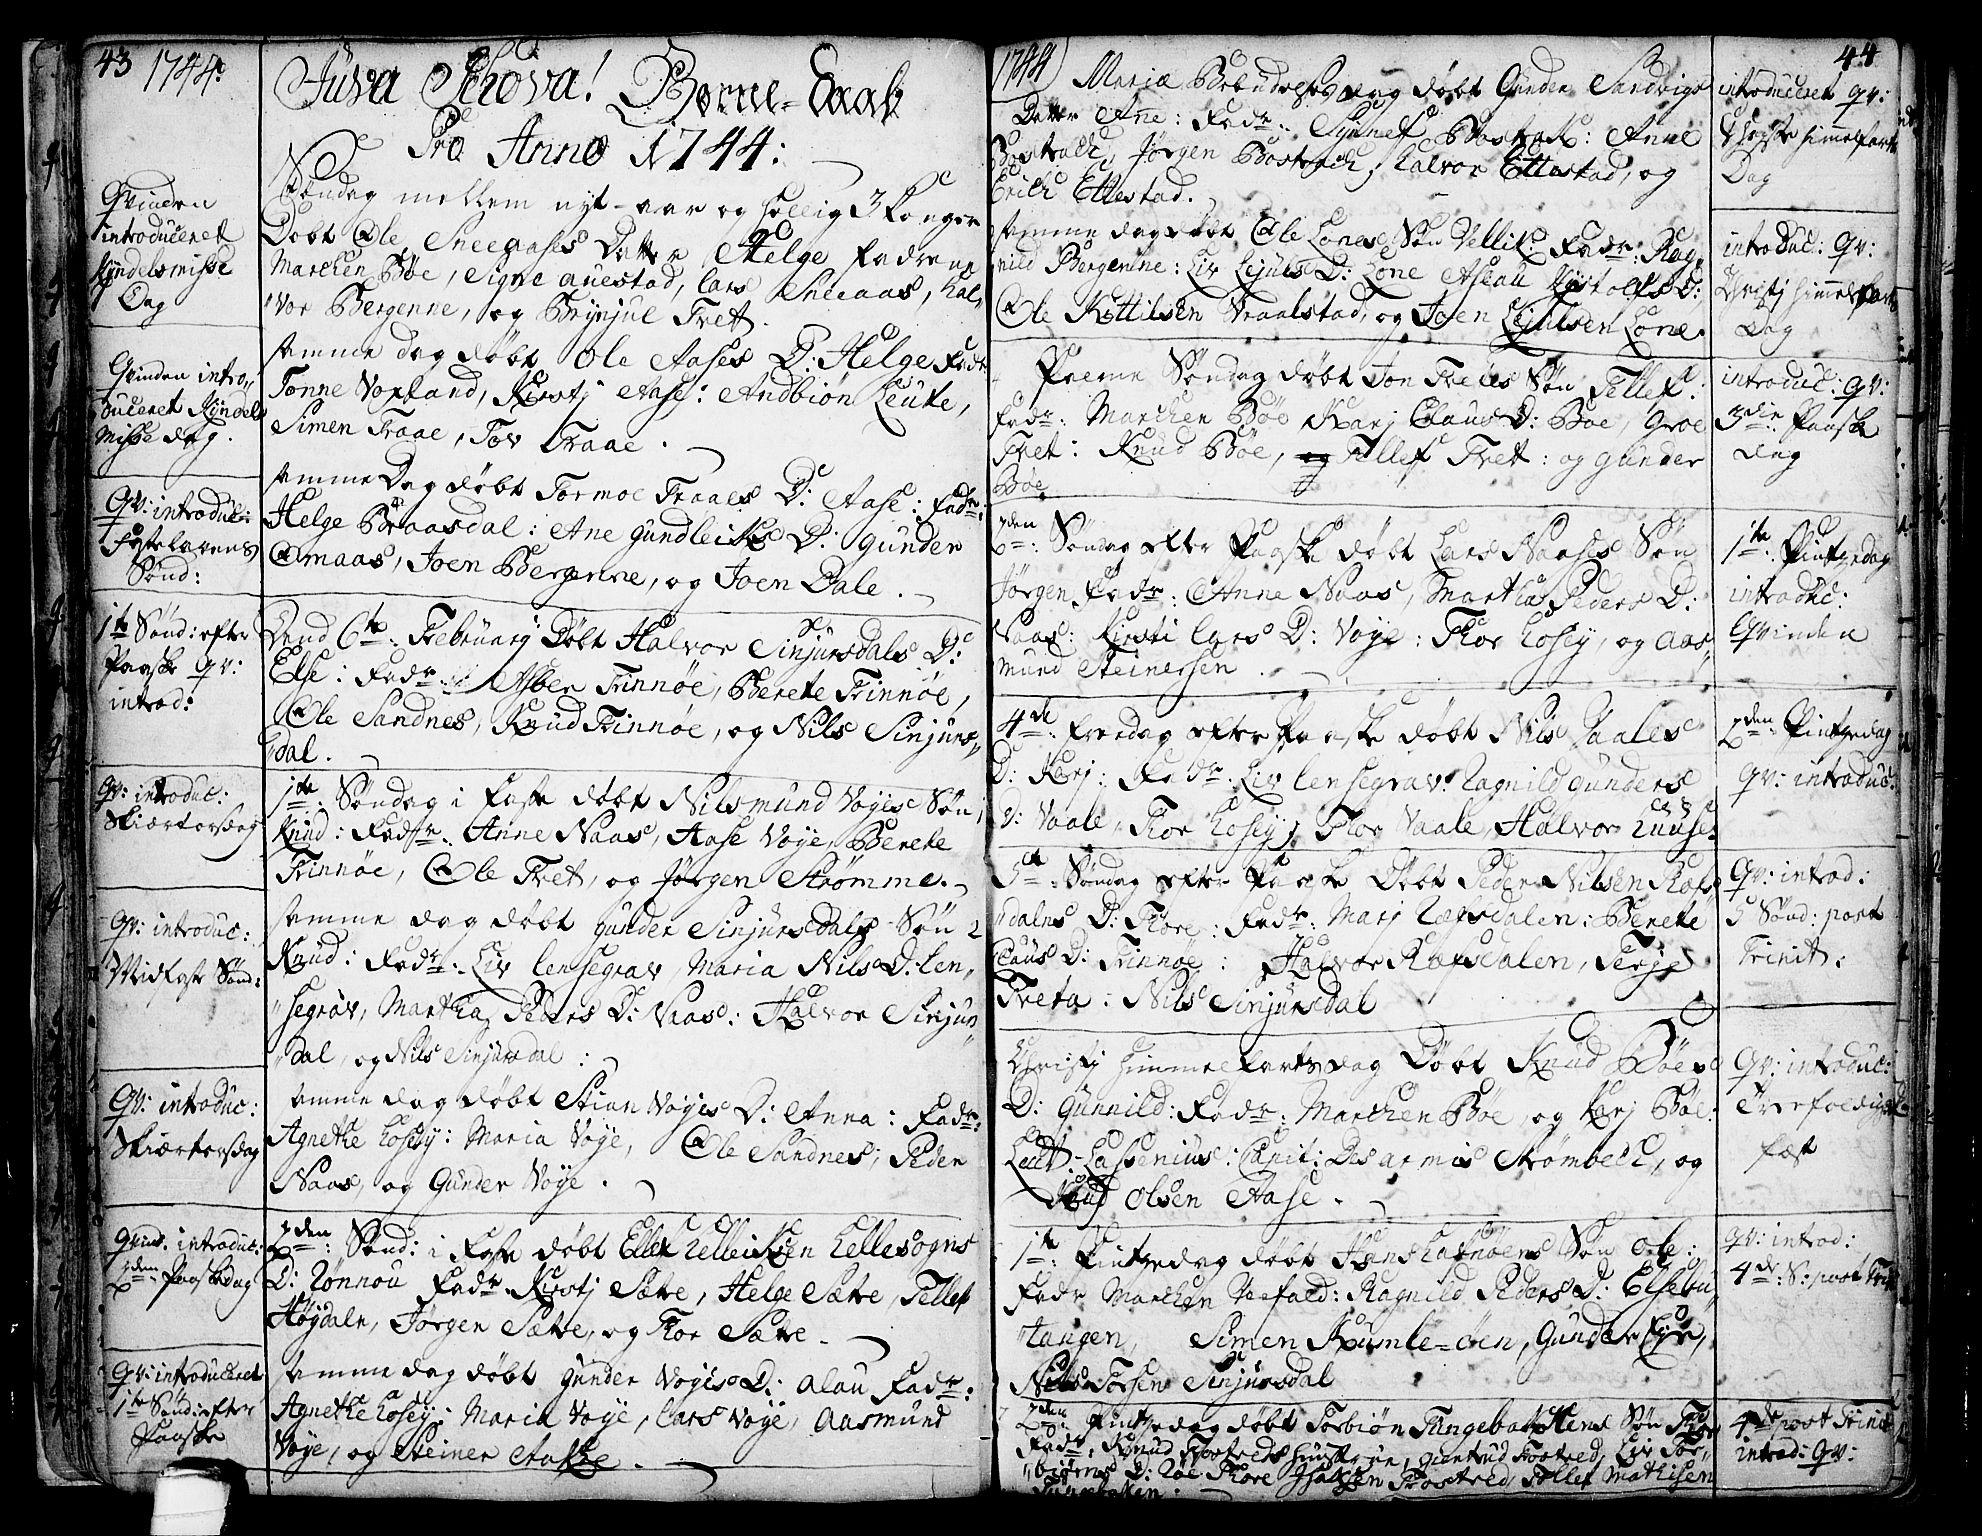 SAKO, Drangedal kirkebøker, F/Fa/L0002: Ministerialbok nr. 2, 1733-1753, s. 43-44